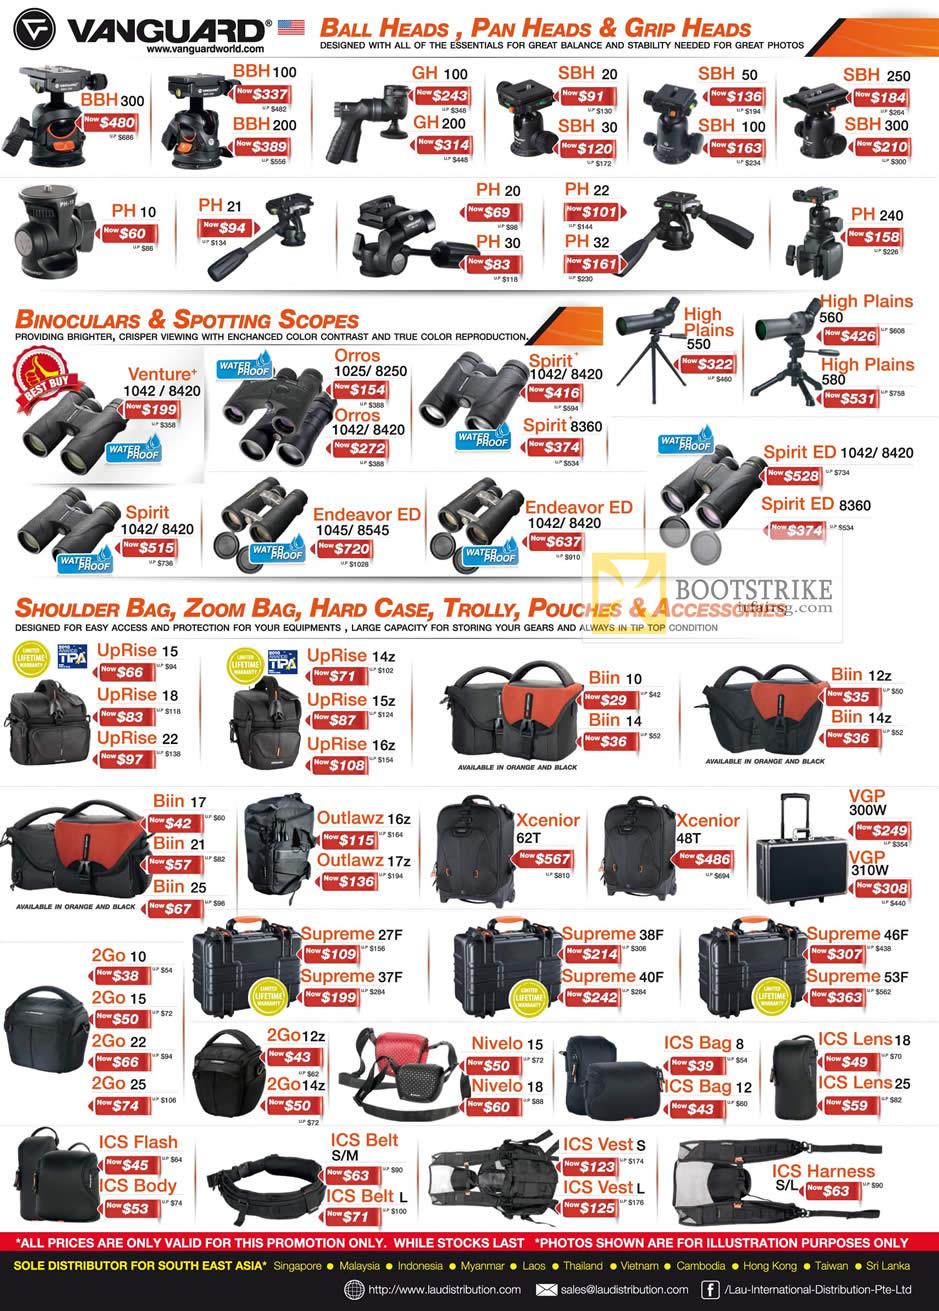 COMEX 2012 price list image brochure of Lau Intl Vanguard Ball Heads, Pan Heads, Grip Heads BBH GH, SBH, PH, Binoculars, Scopes, Bags, Belts, Flash